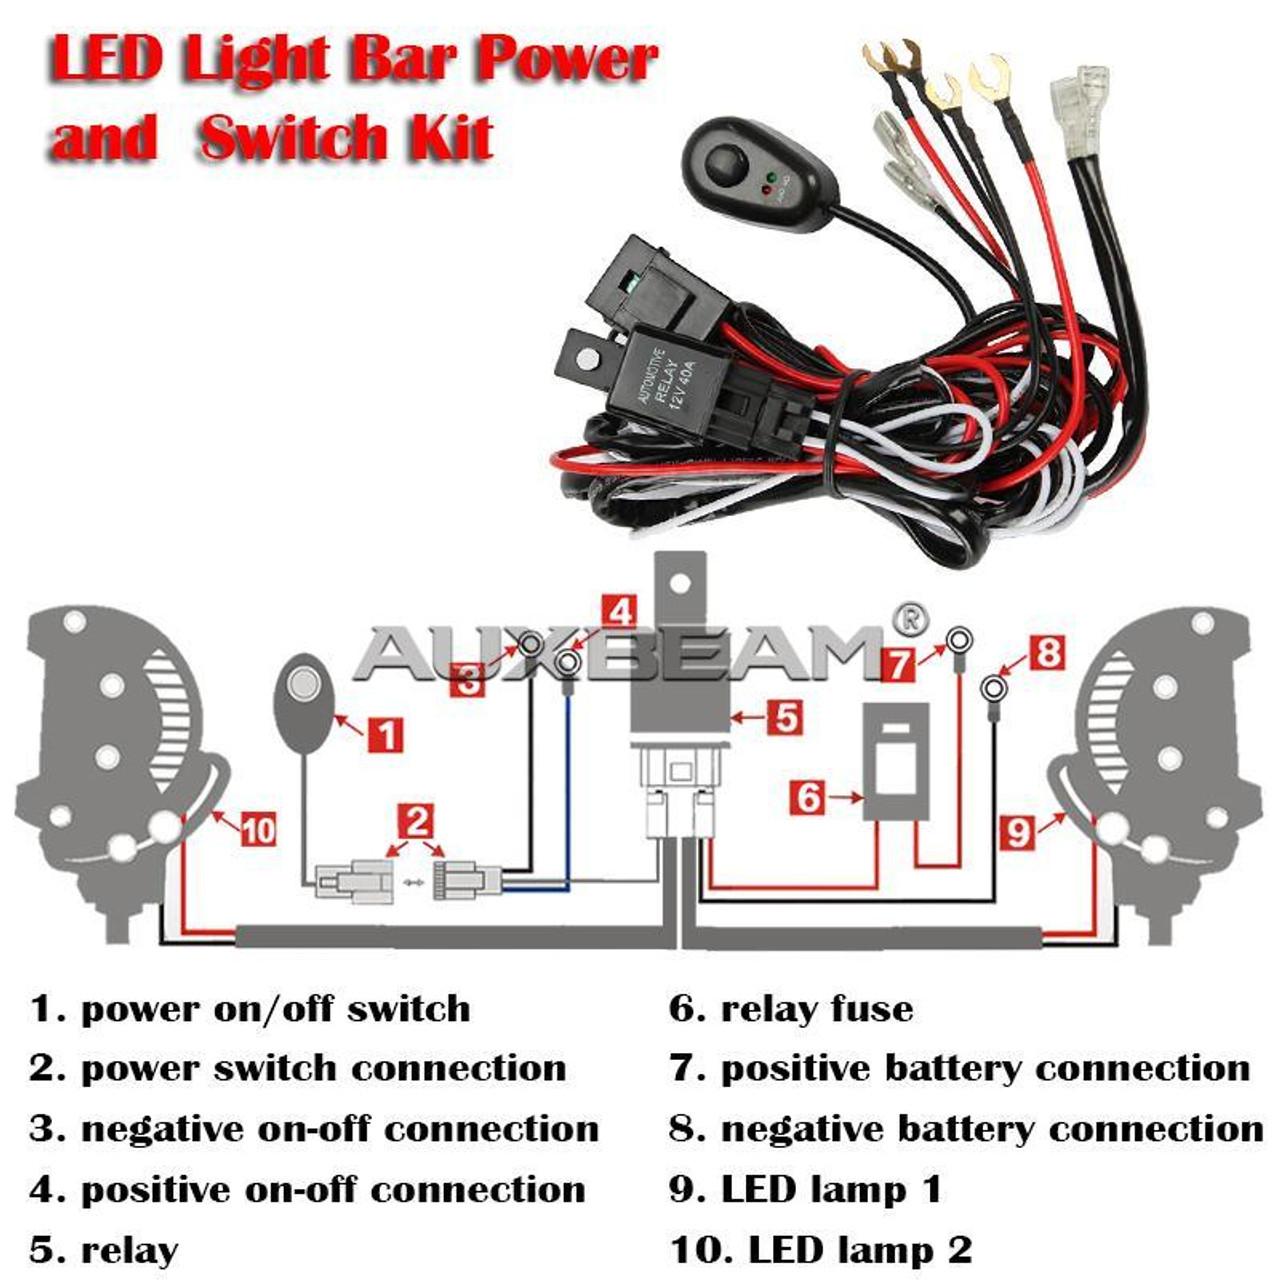 medium resolution of 12v 40a led light bar wiring harness kit dual lights 12v 40a led light bar